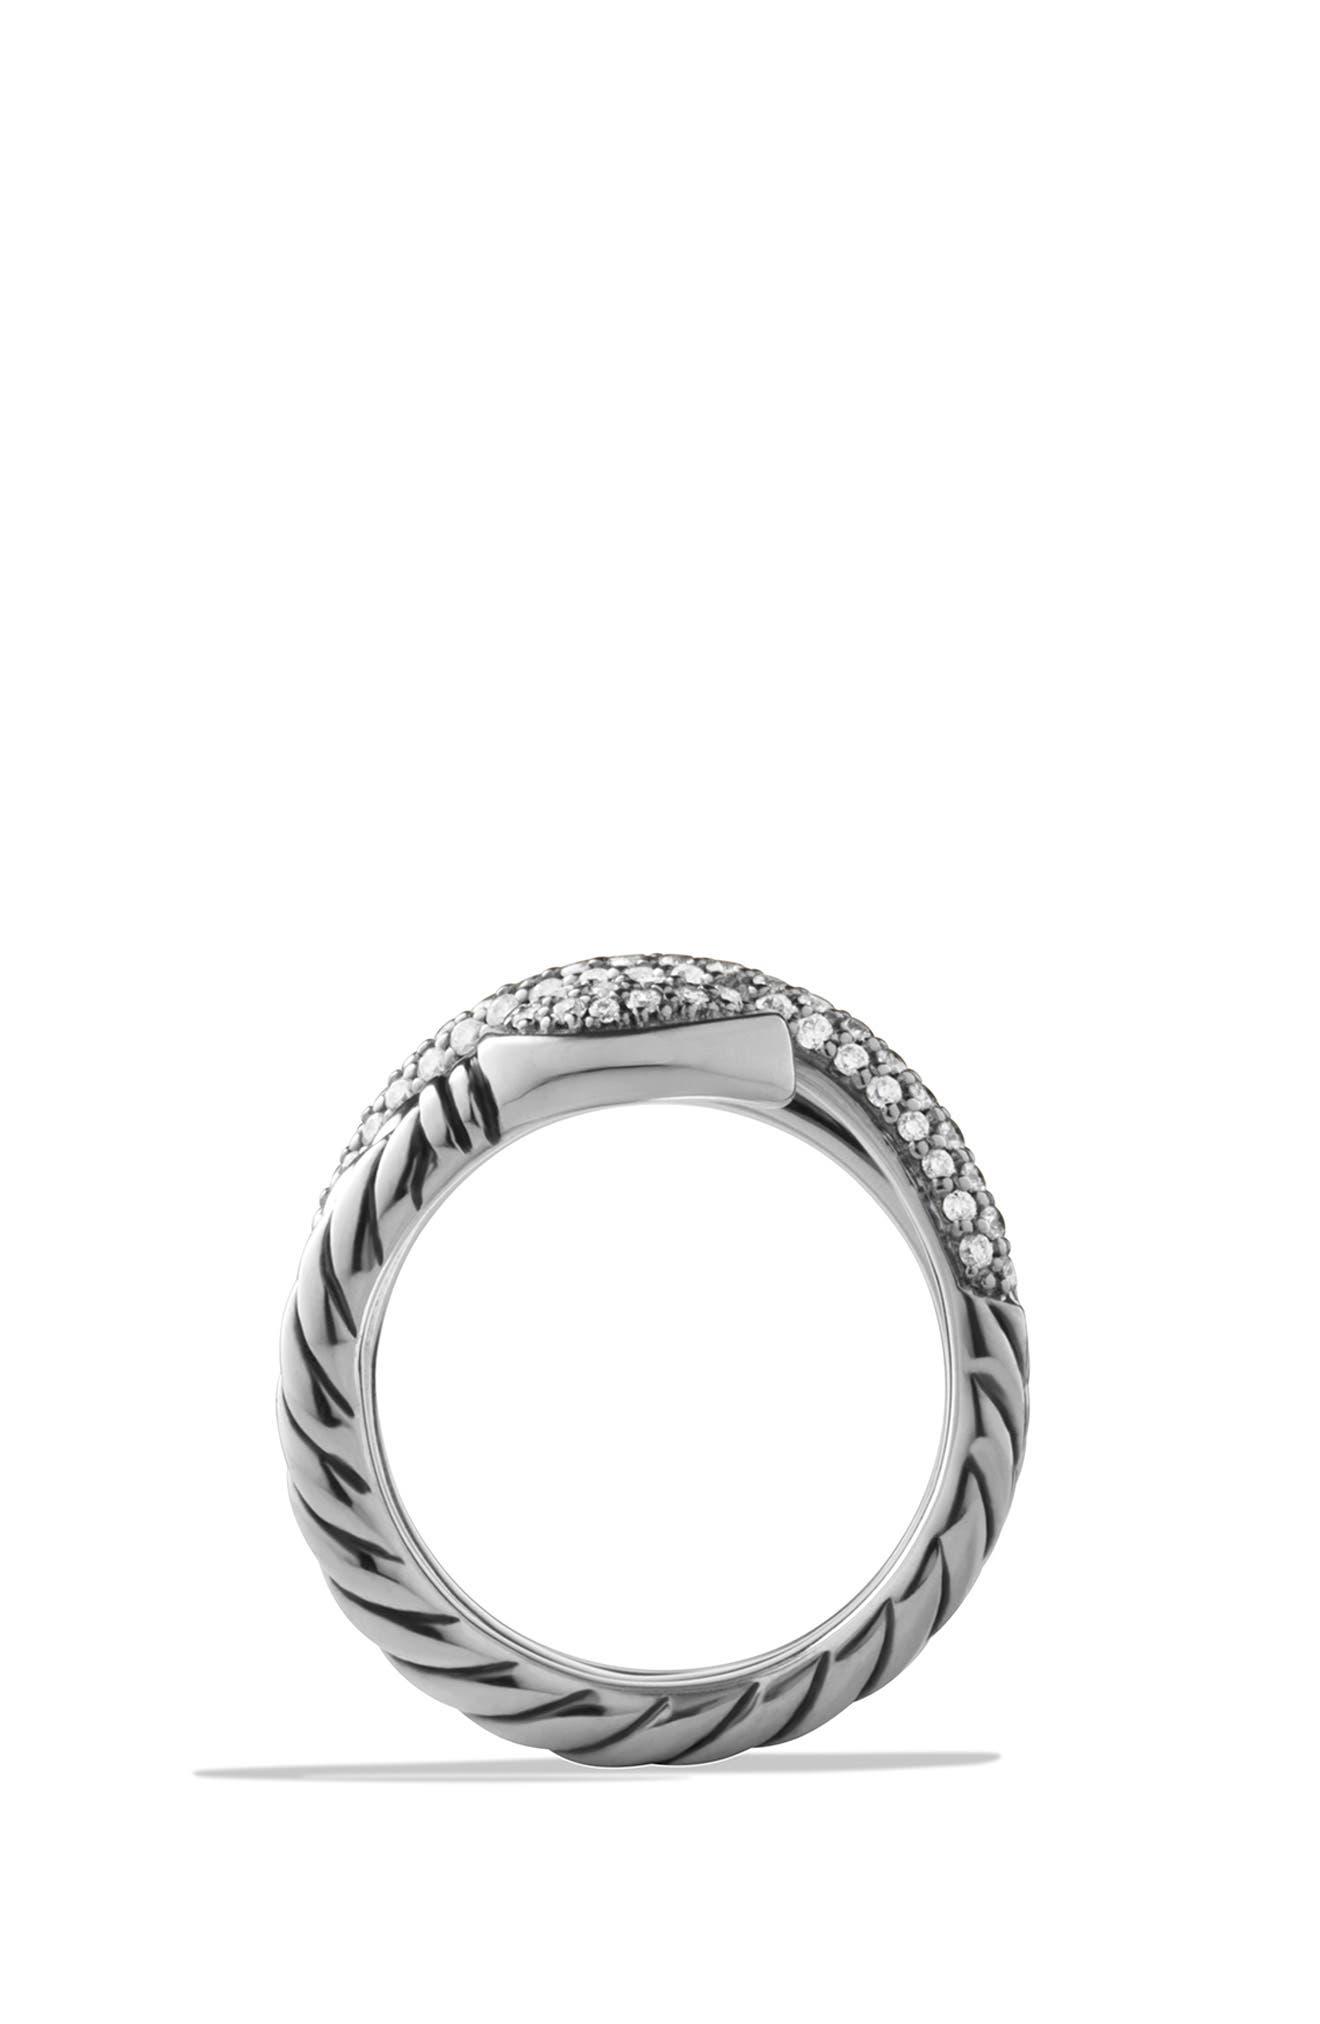 'Renaissance' Ring with Diamonds,                             Alternate thumbnail 4, color,                             040